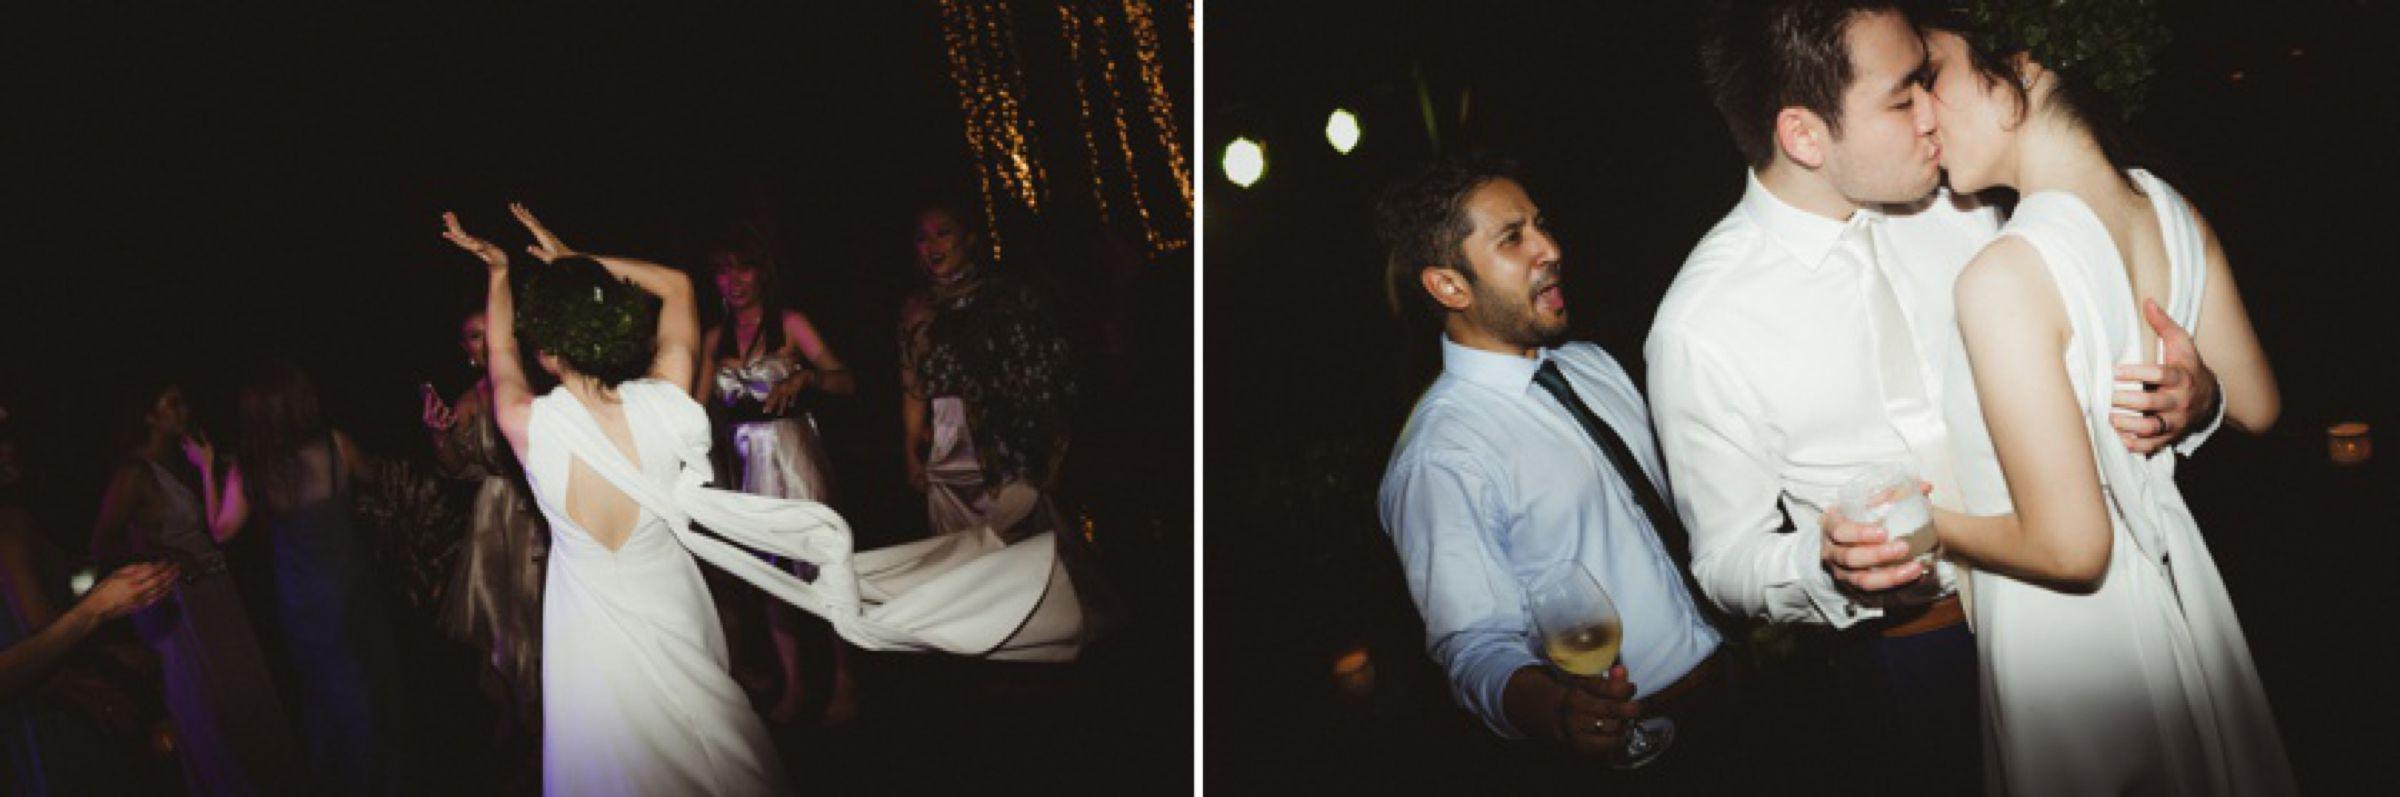 Tim-Danika-Bali-Wedding-Pyara-Photo-Evans 50.jpg